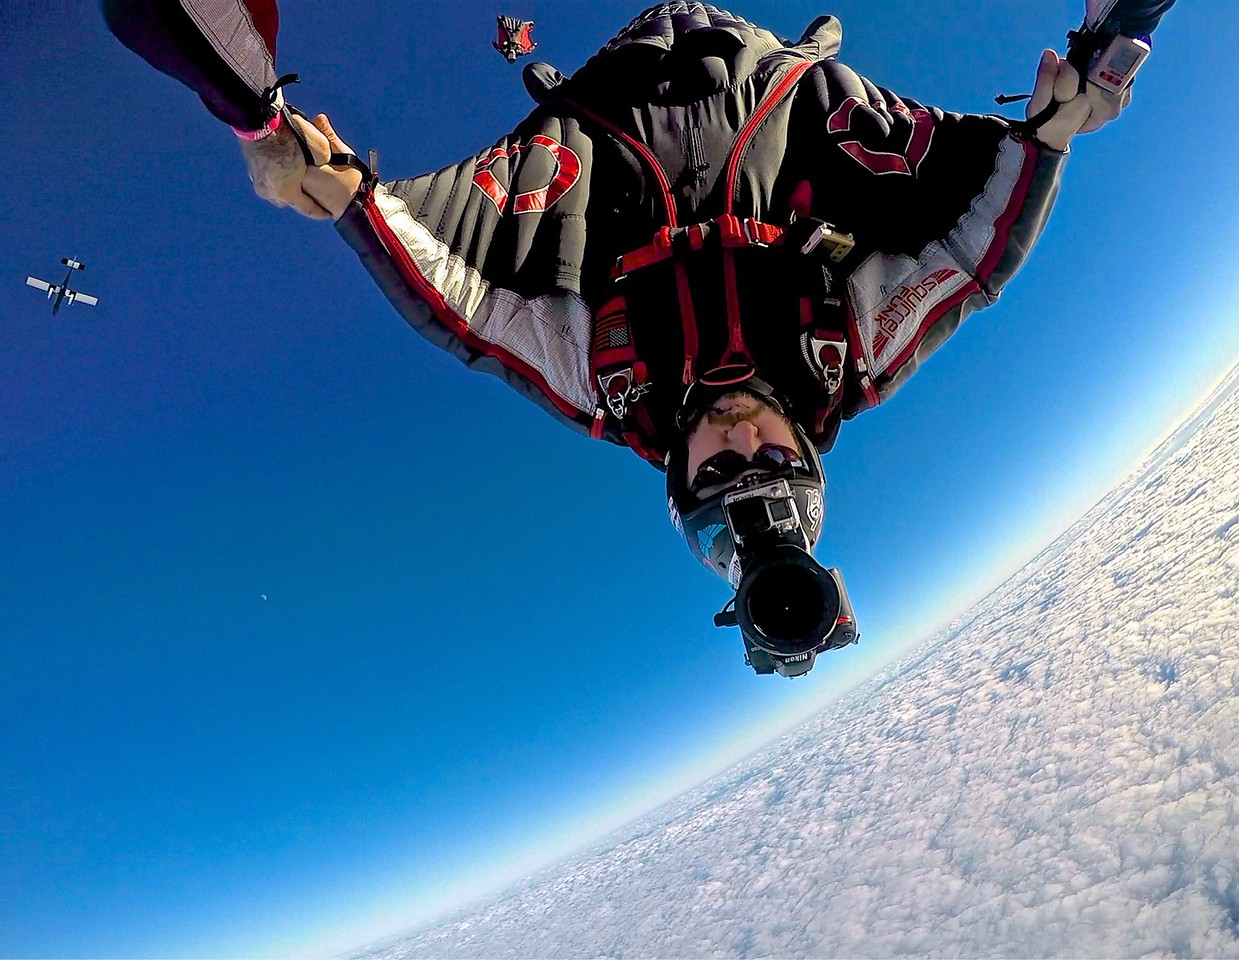 Head down wingsuit flight